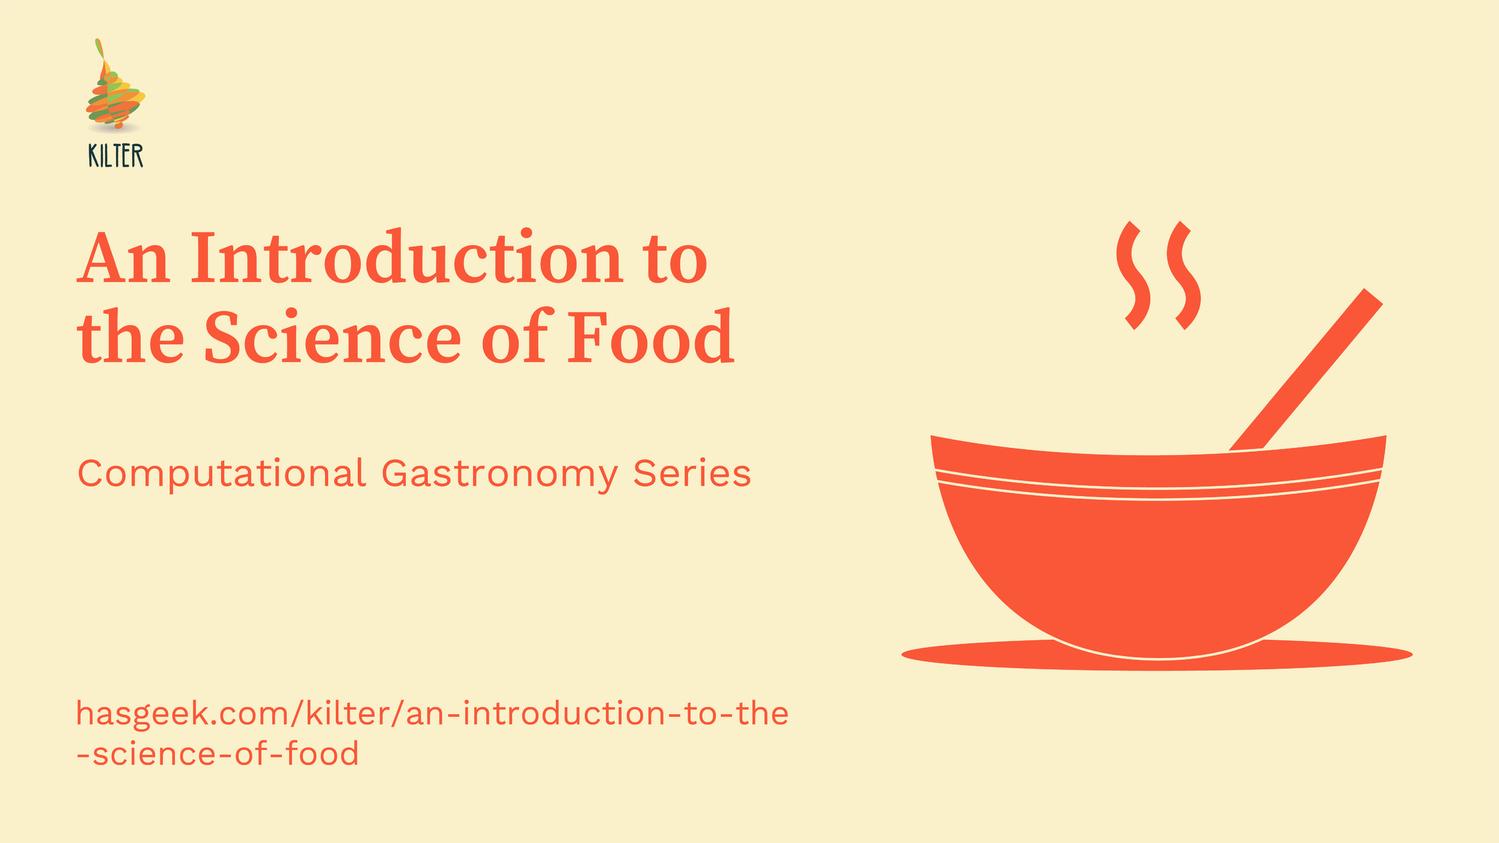 Computational Gastronomy